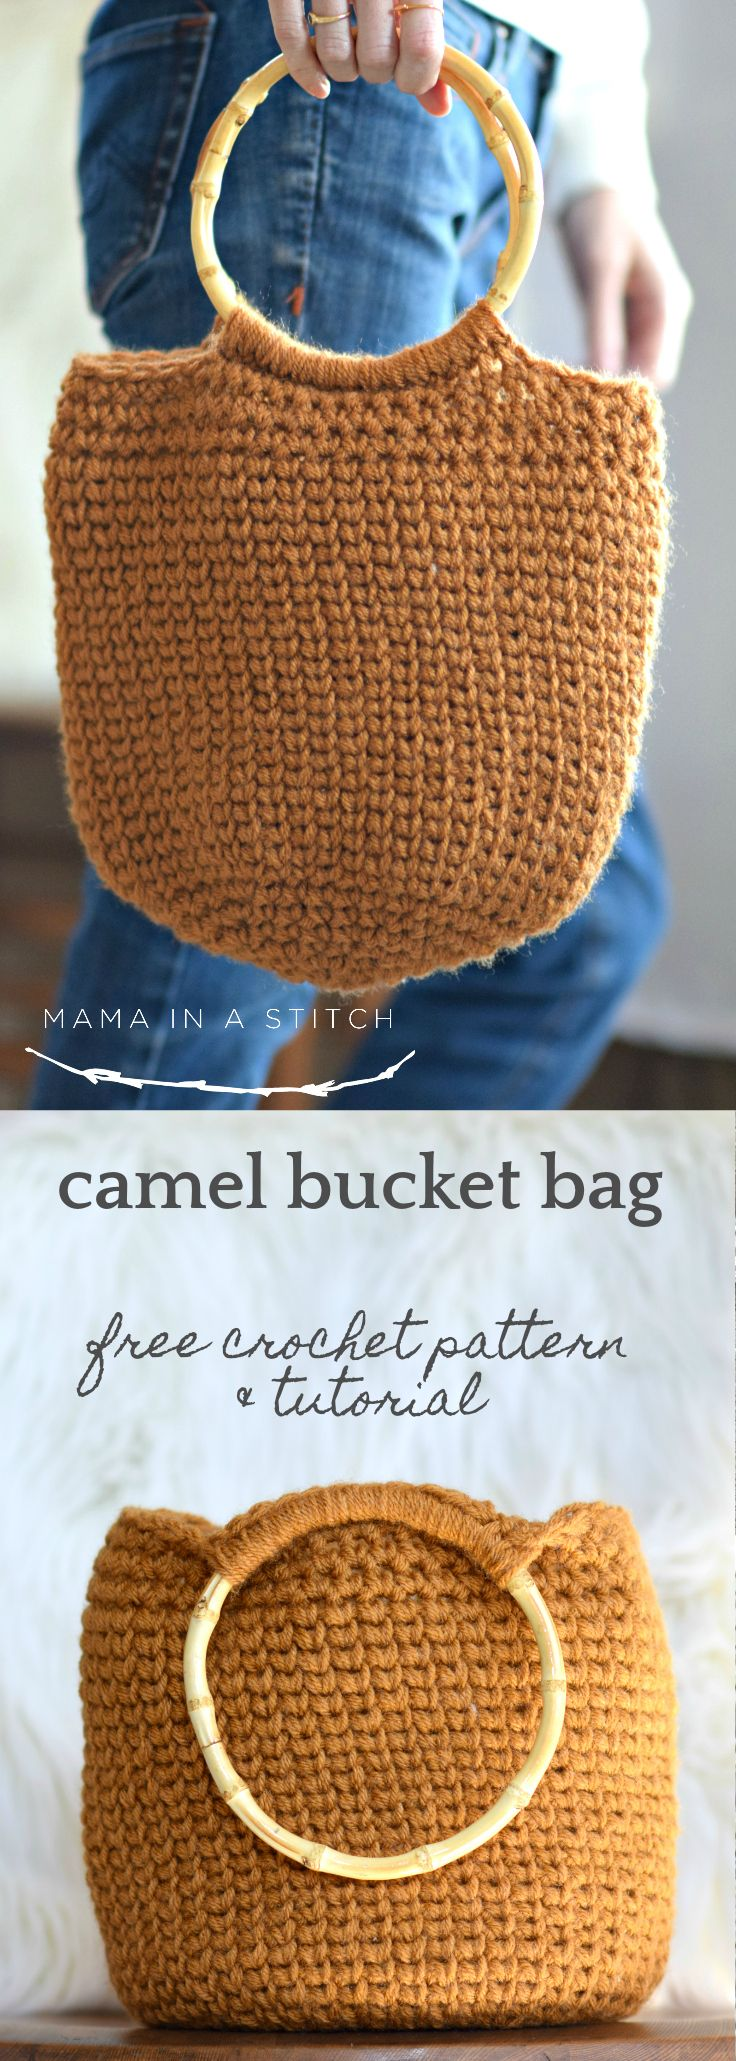 Camel Bucket Bag – Crocheted Bag Pattern via @MamaInAStitch